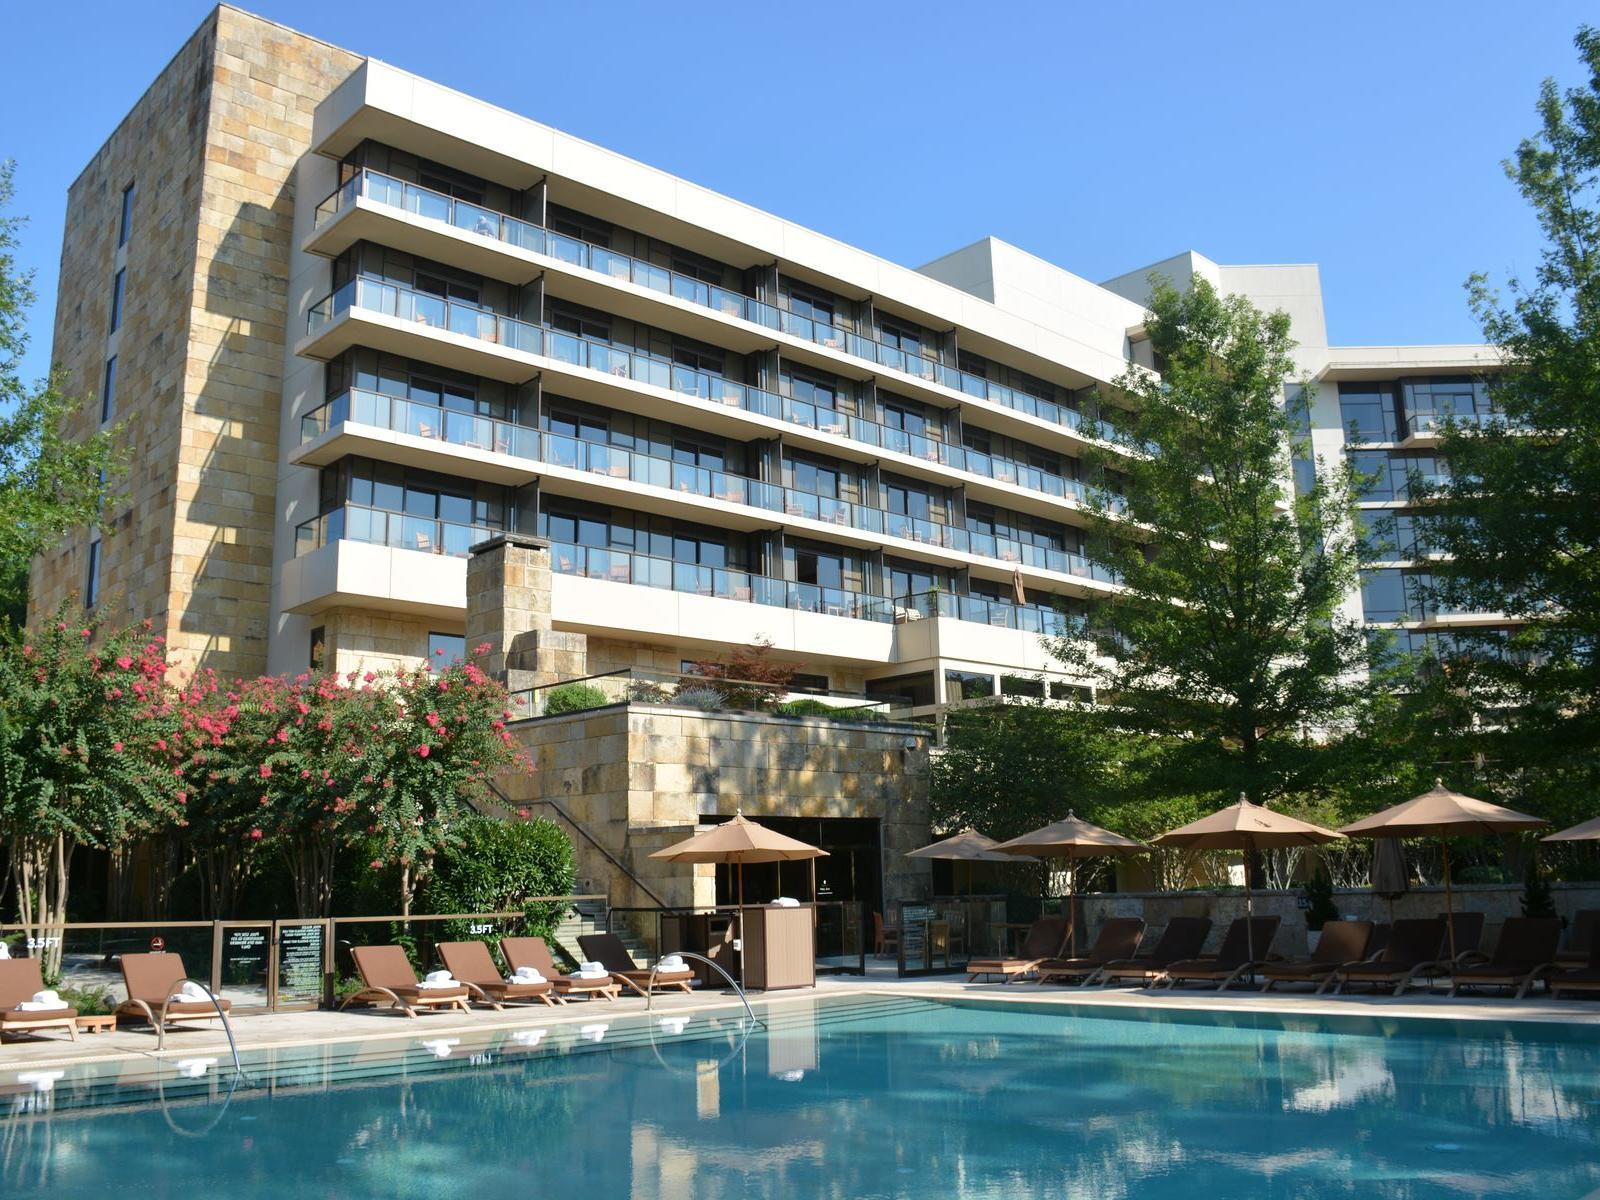 Umstead Hotel - Poolside